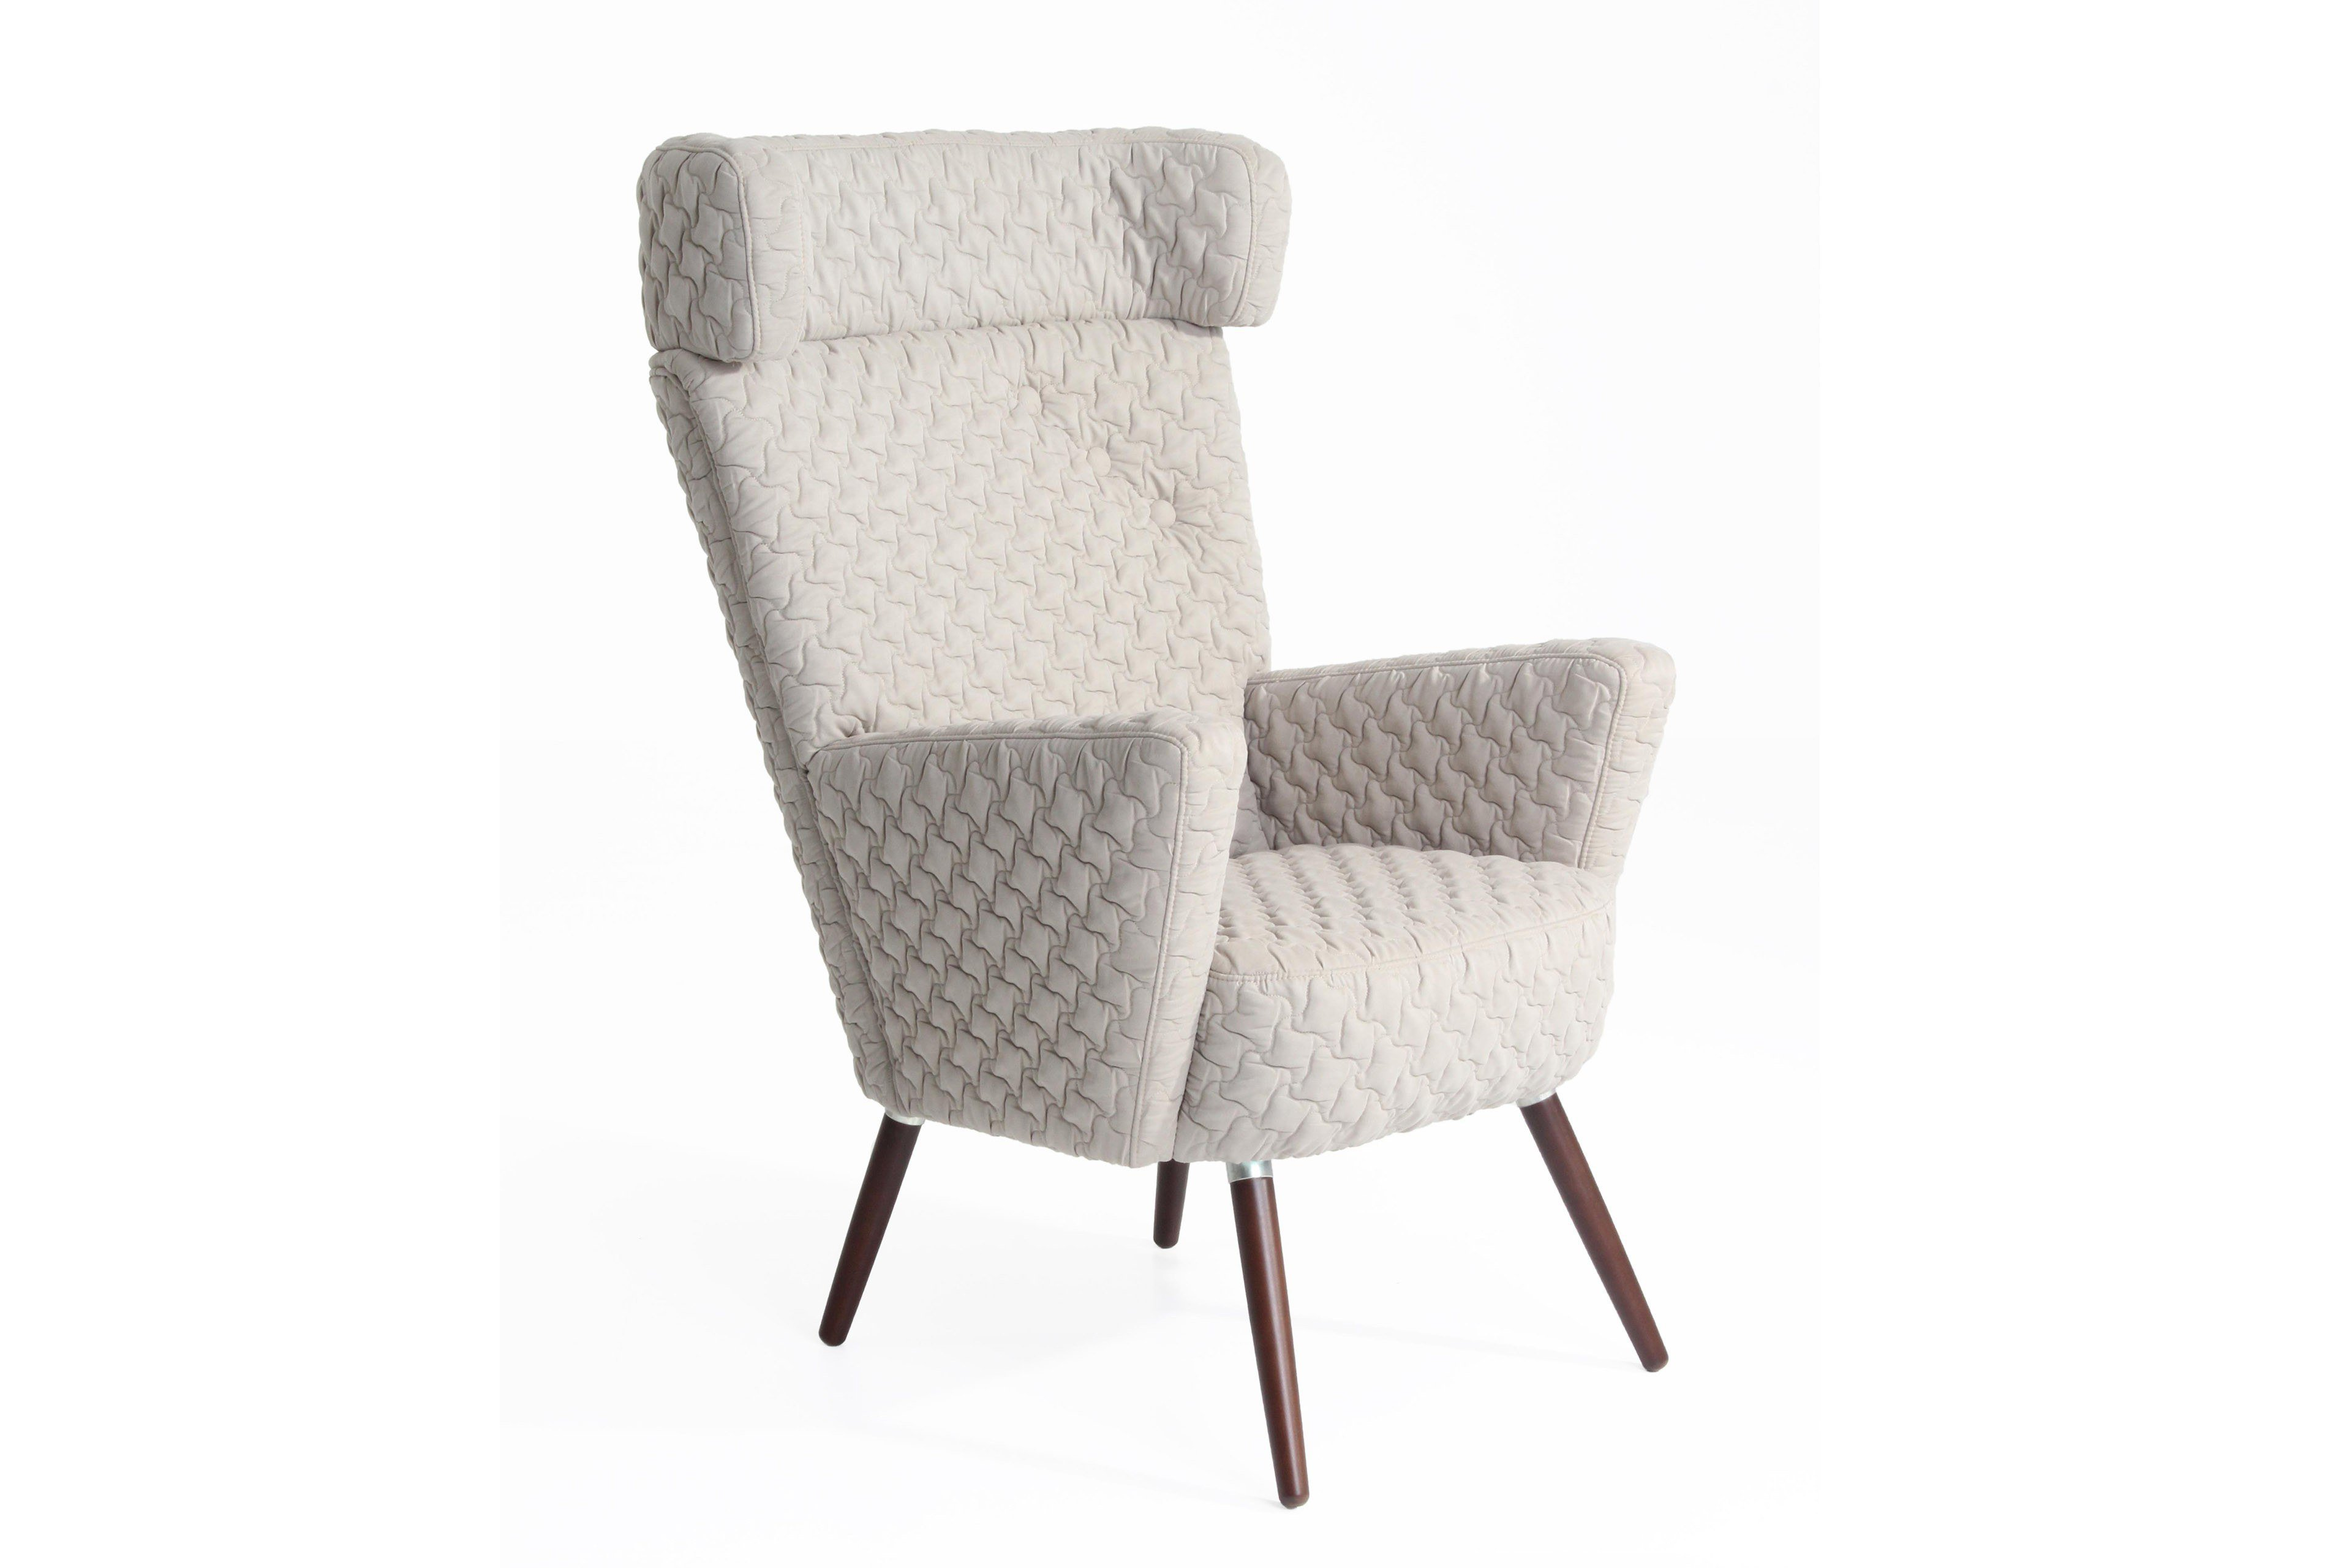 ohrensessel beige previous with ohrensessel beige. Black Bedroom Furniture Sets. Home Design Ideas